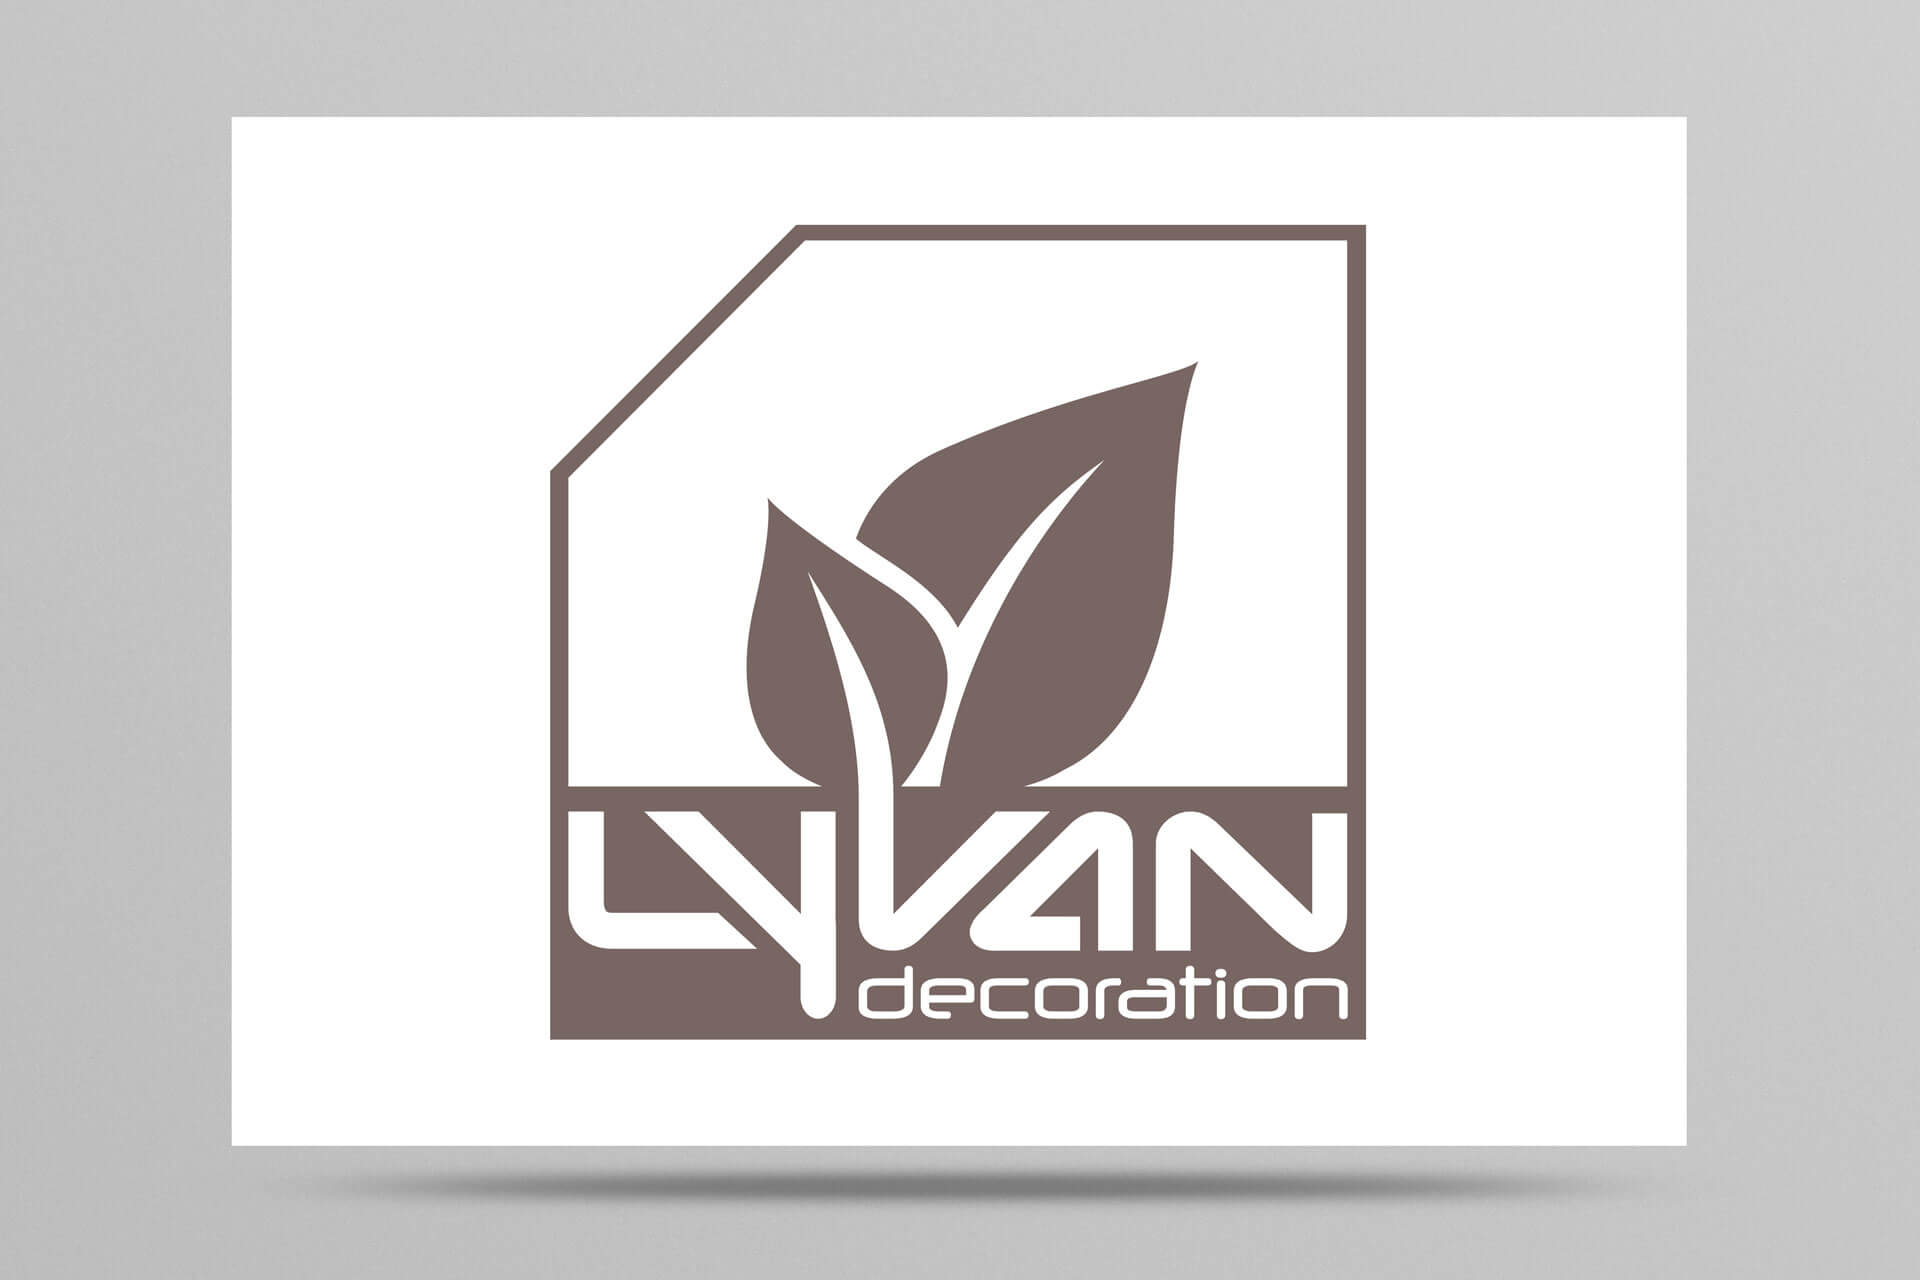 LyVan logo 0